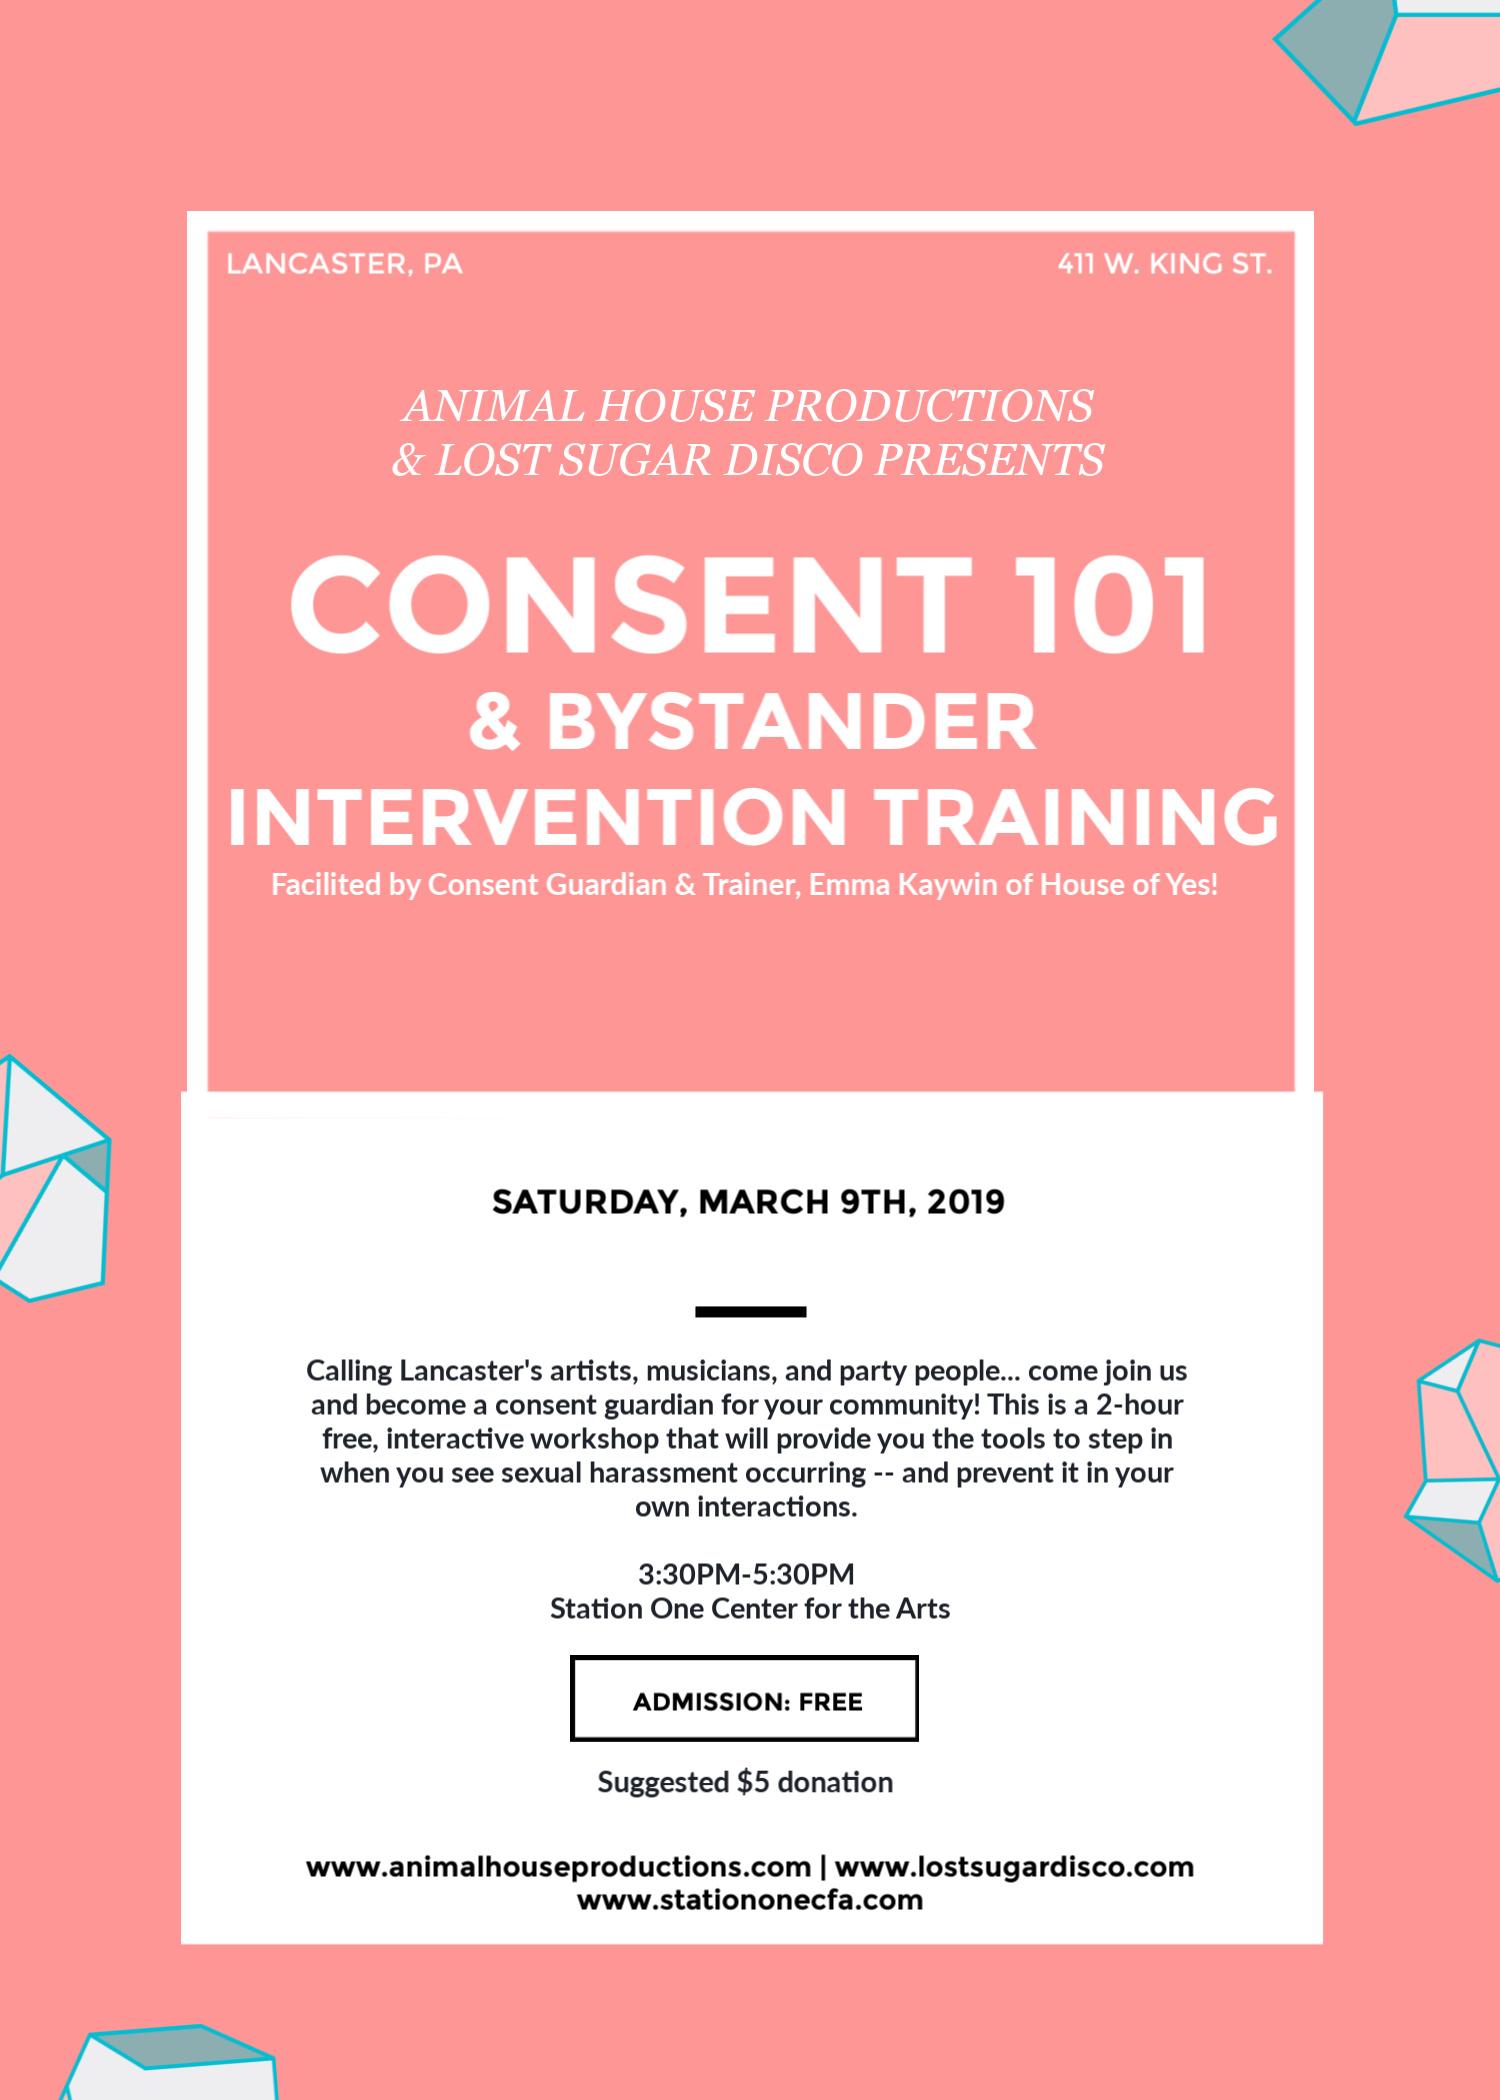 consent101flyer (1).jpg